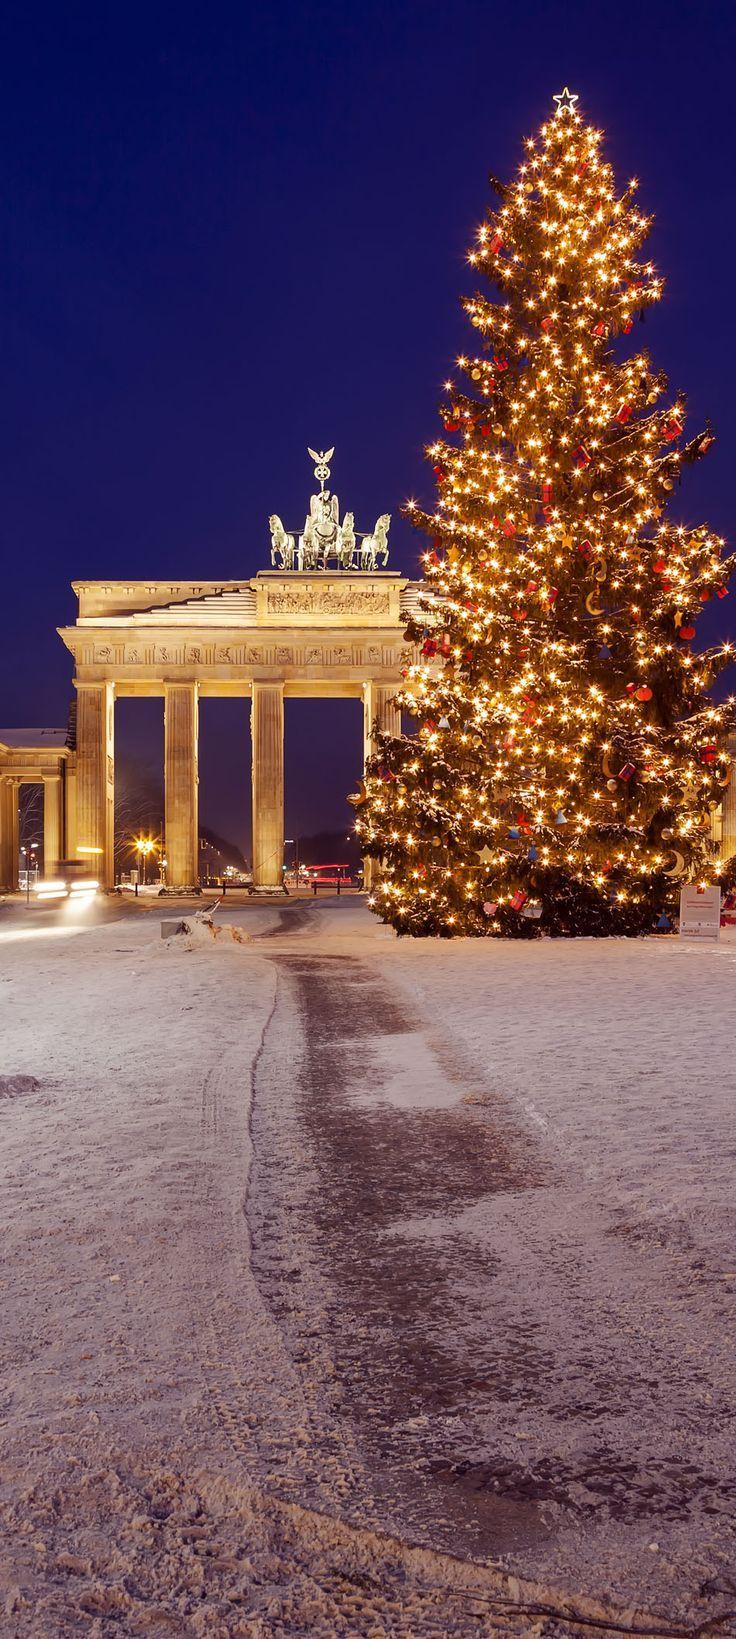 Christmas at Brandenburg gate in winter, Berlin http://imgsnpics.com/christmas-at-brandenburg-gate-in-winter-berlin/